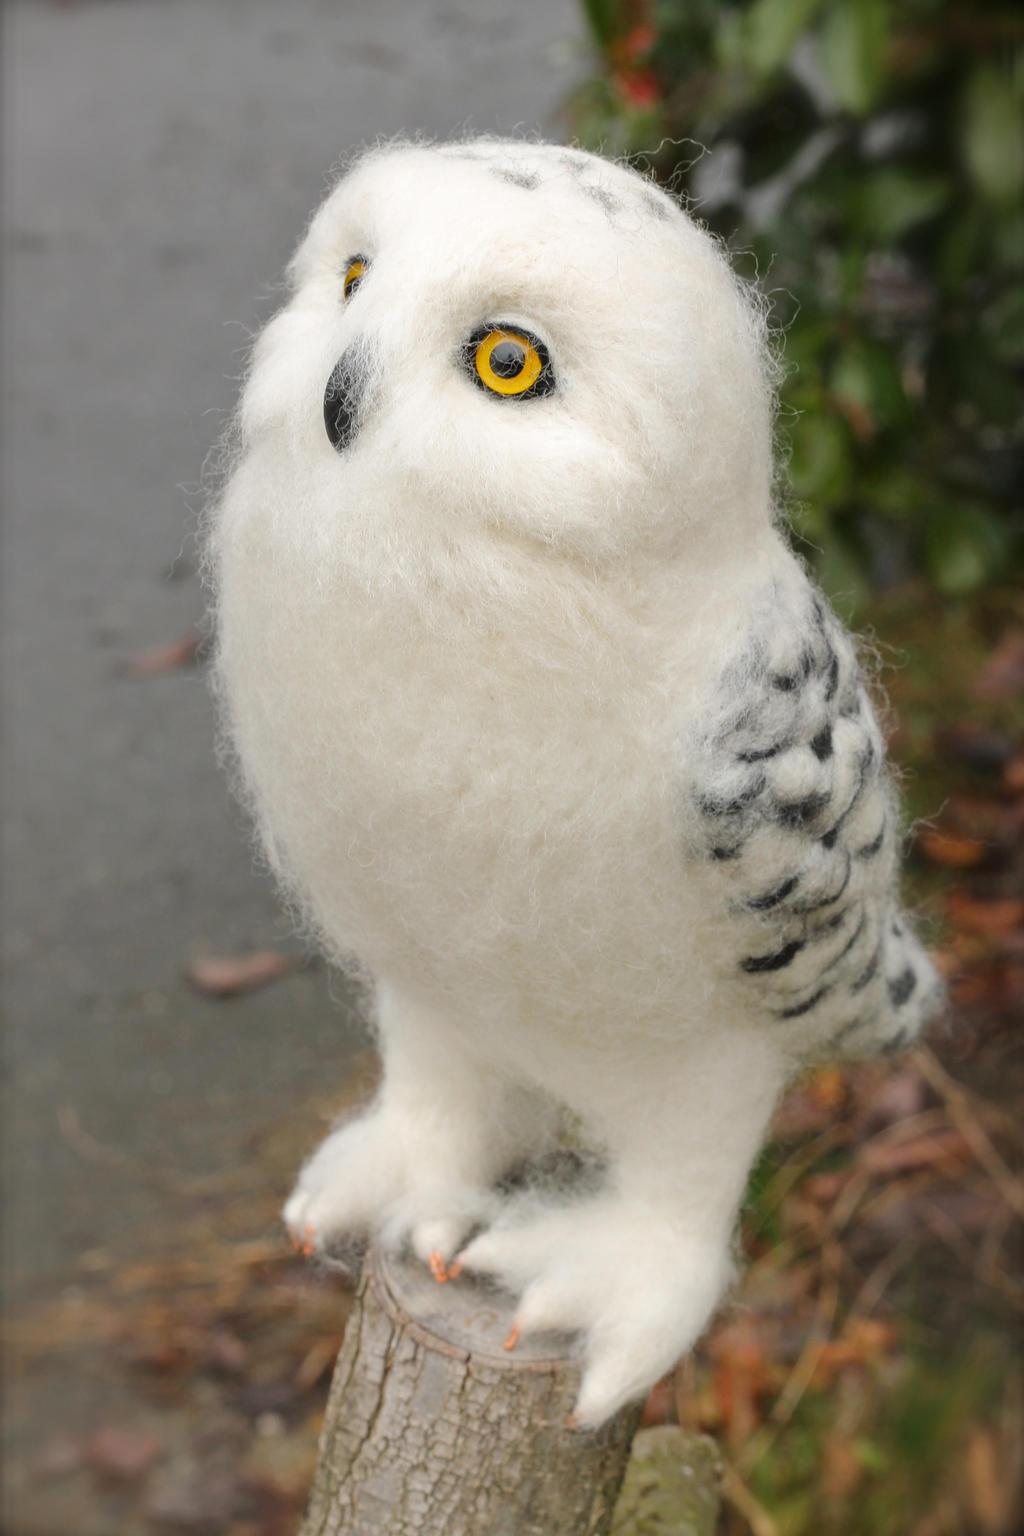 Cute baby white owl - photo#31